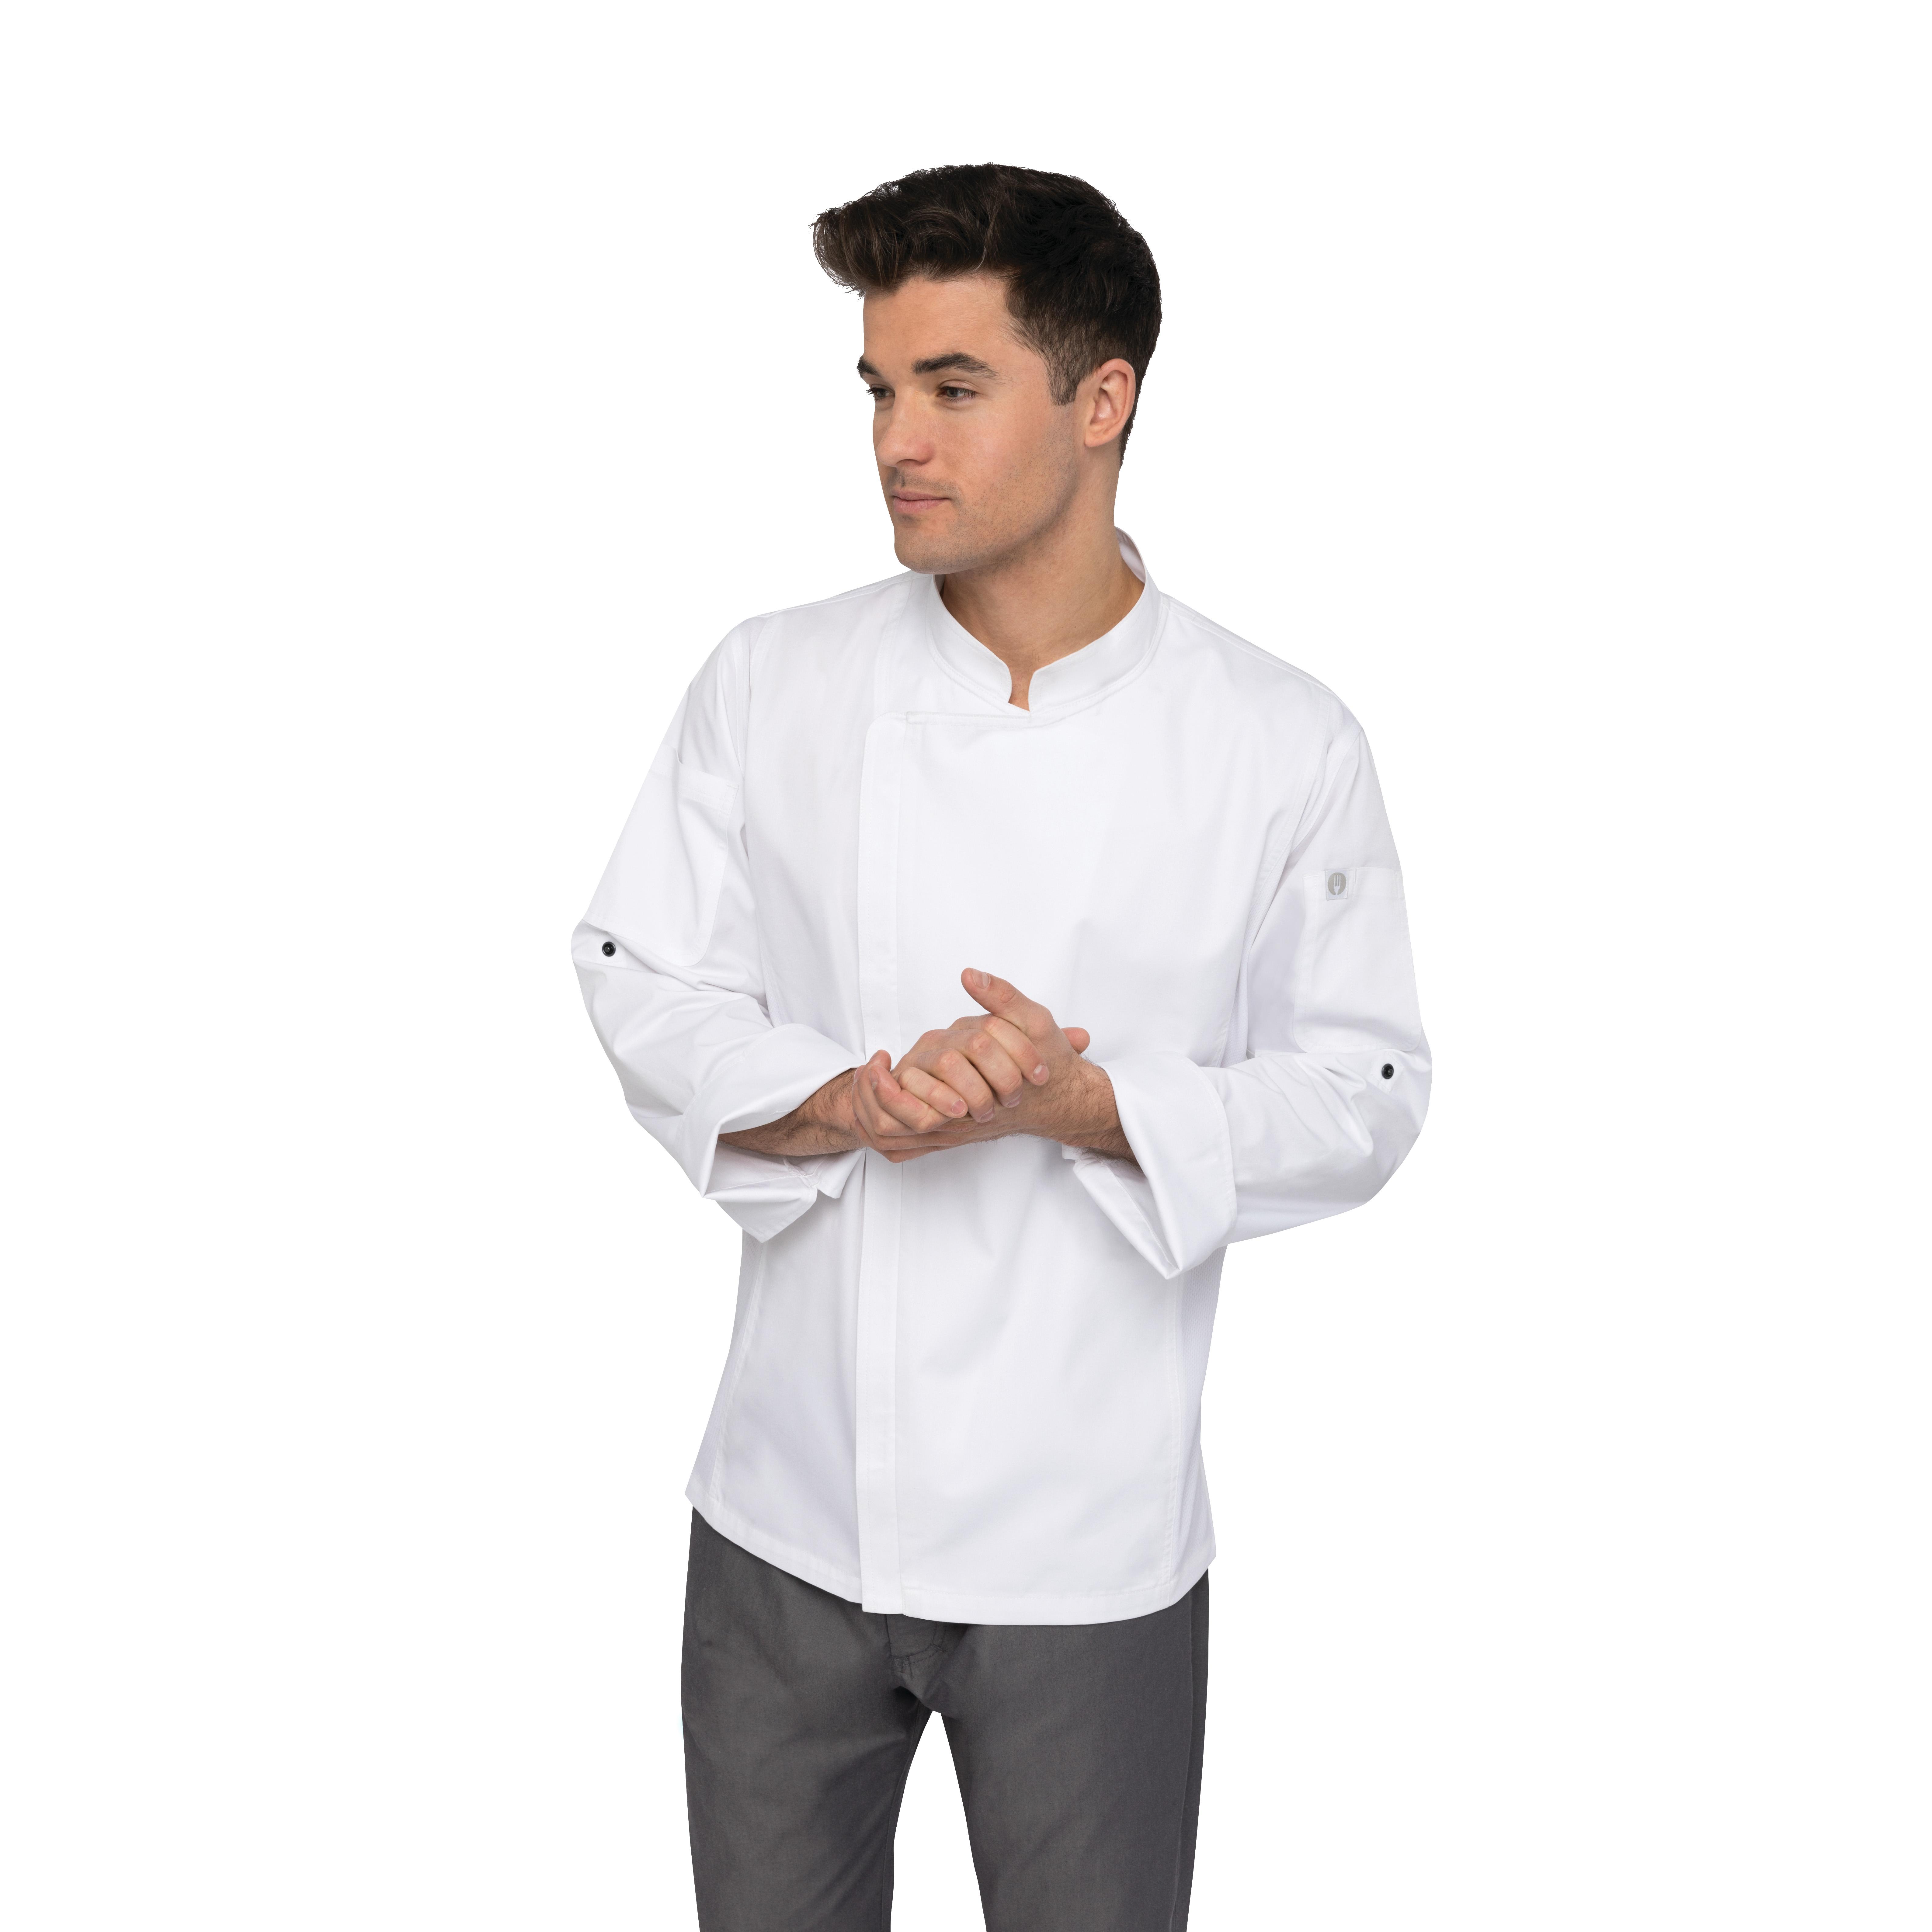 Chef Works BCLZ008WHT2XL chef's coat